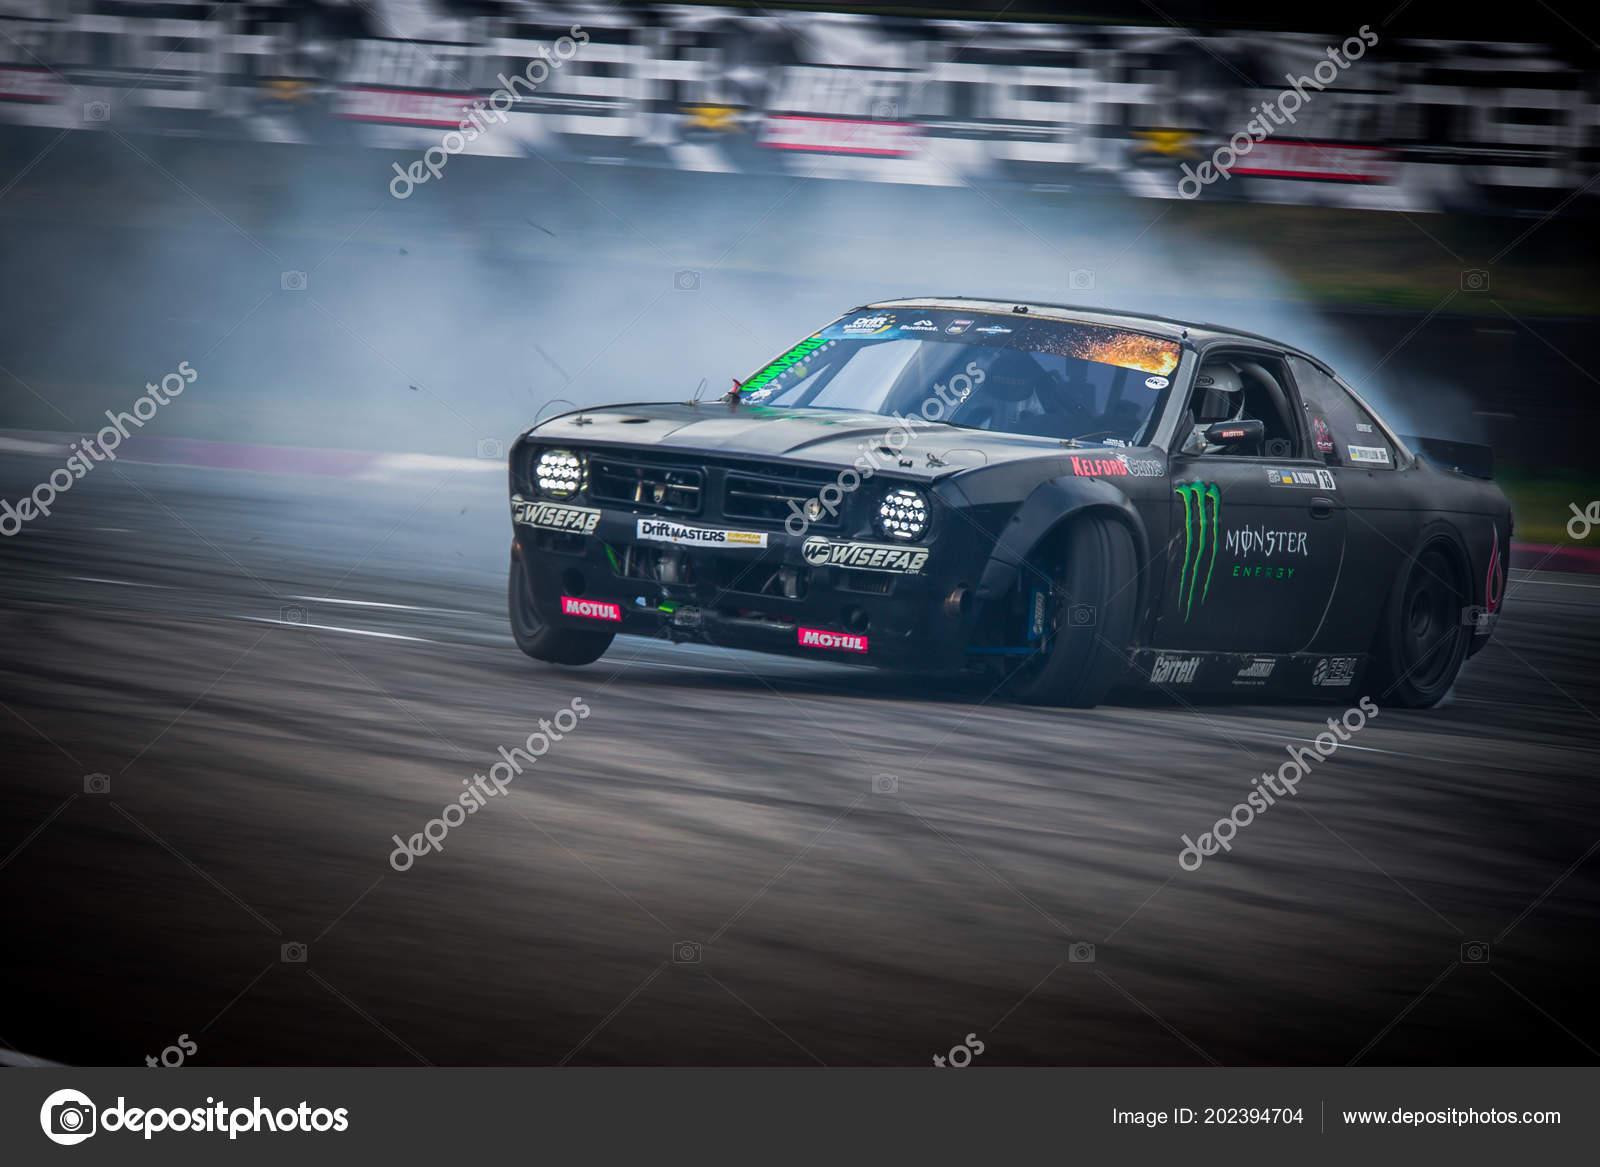 Riga Latvia June 30th 2018 Drift Car Motion Photo Taken Stock Editorial Photo C Vshivkova 202394704